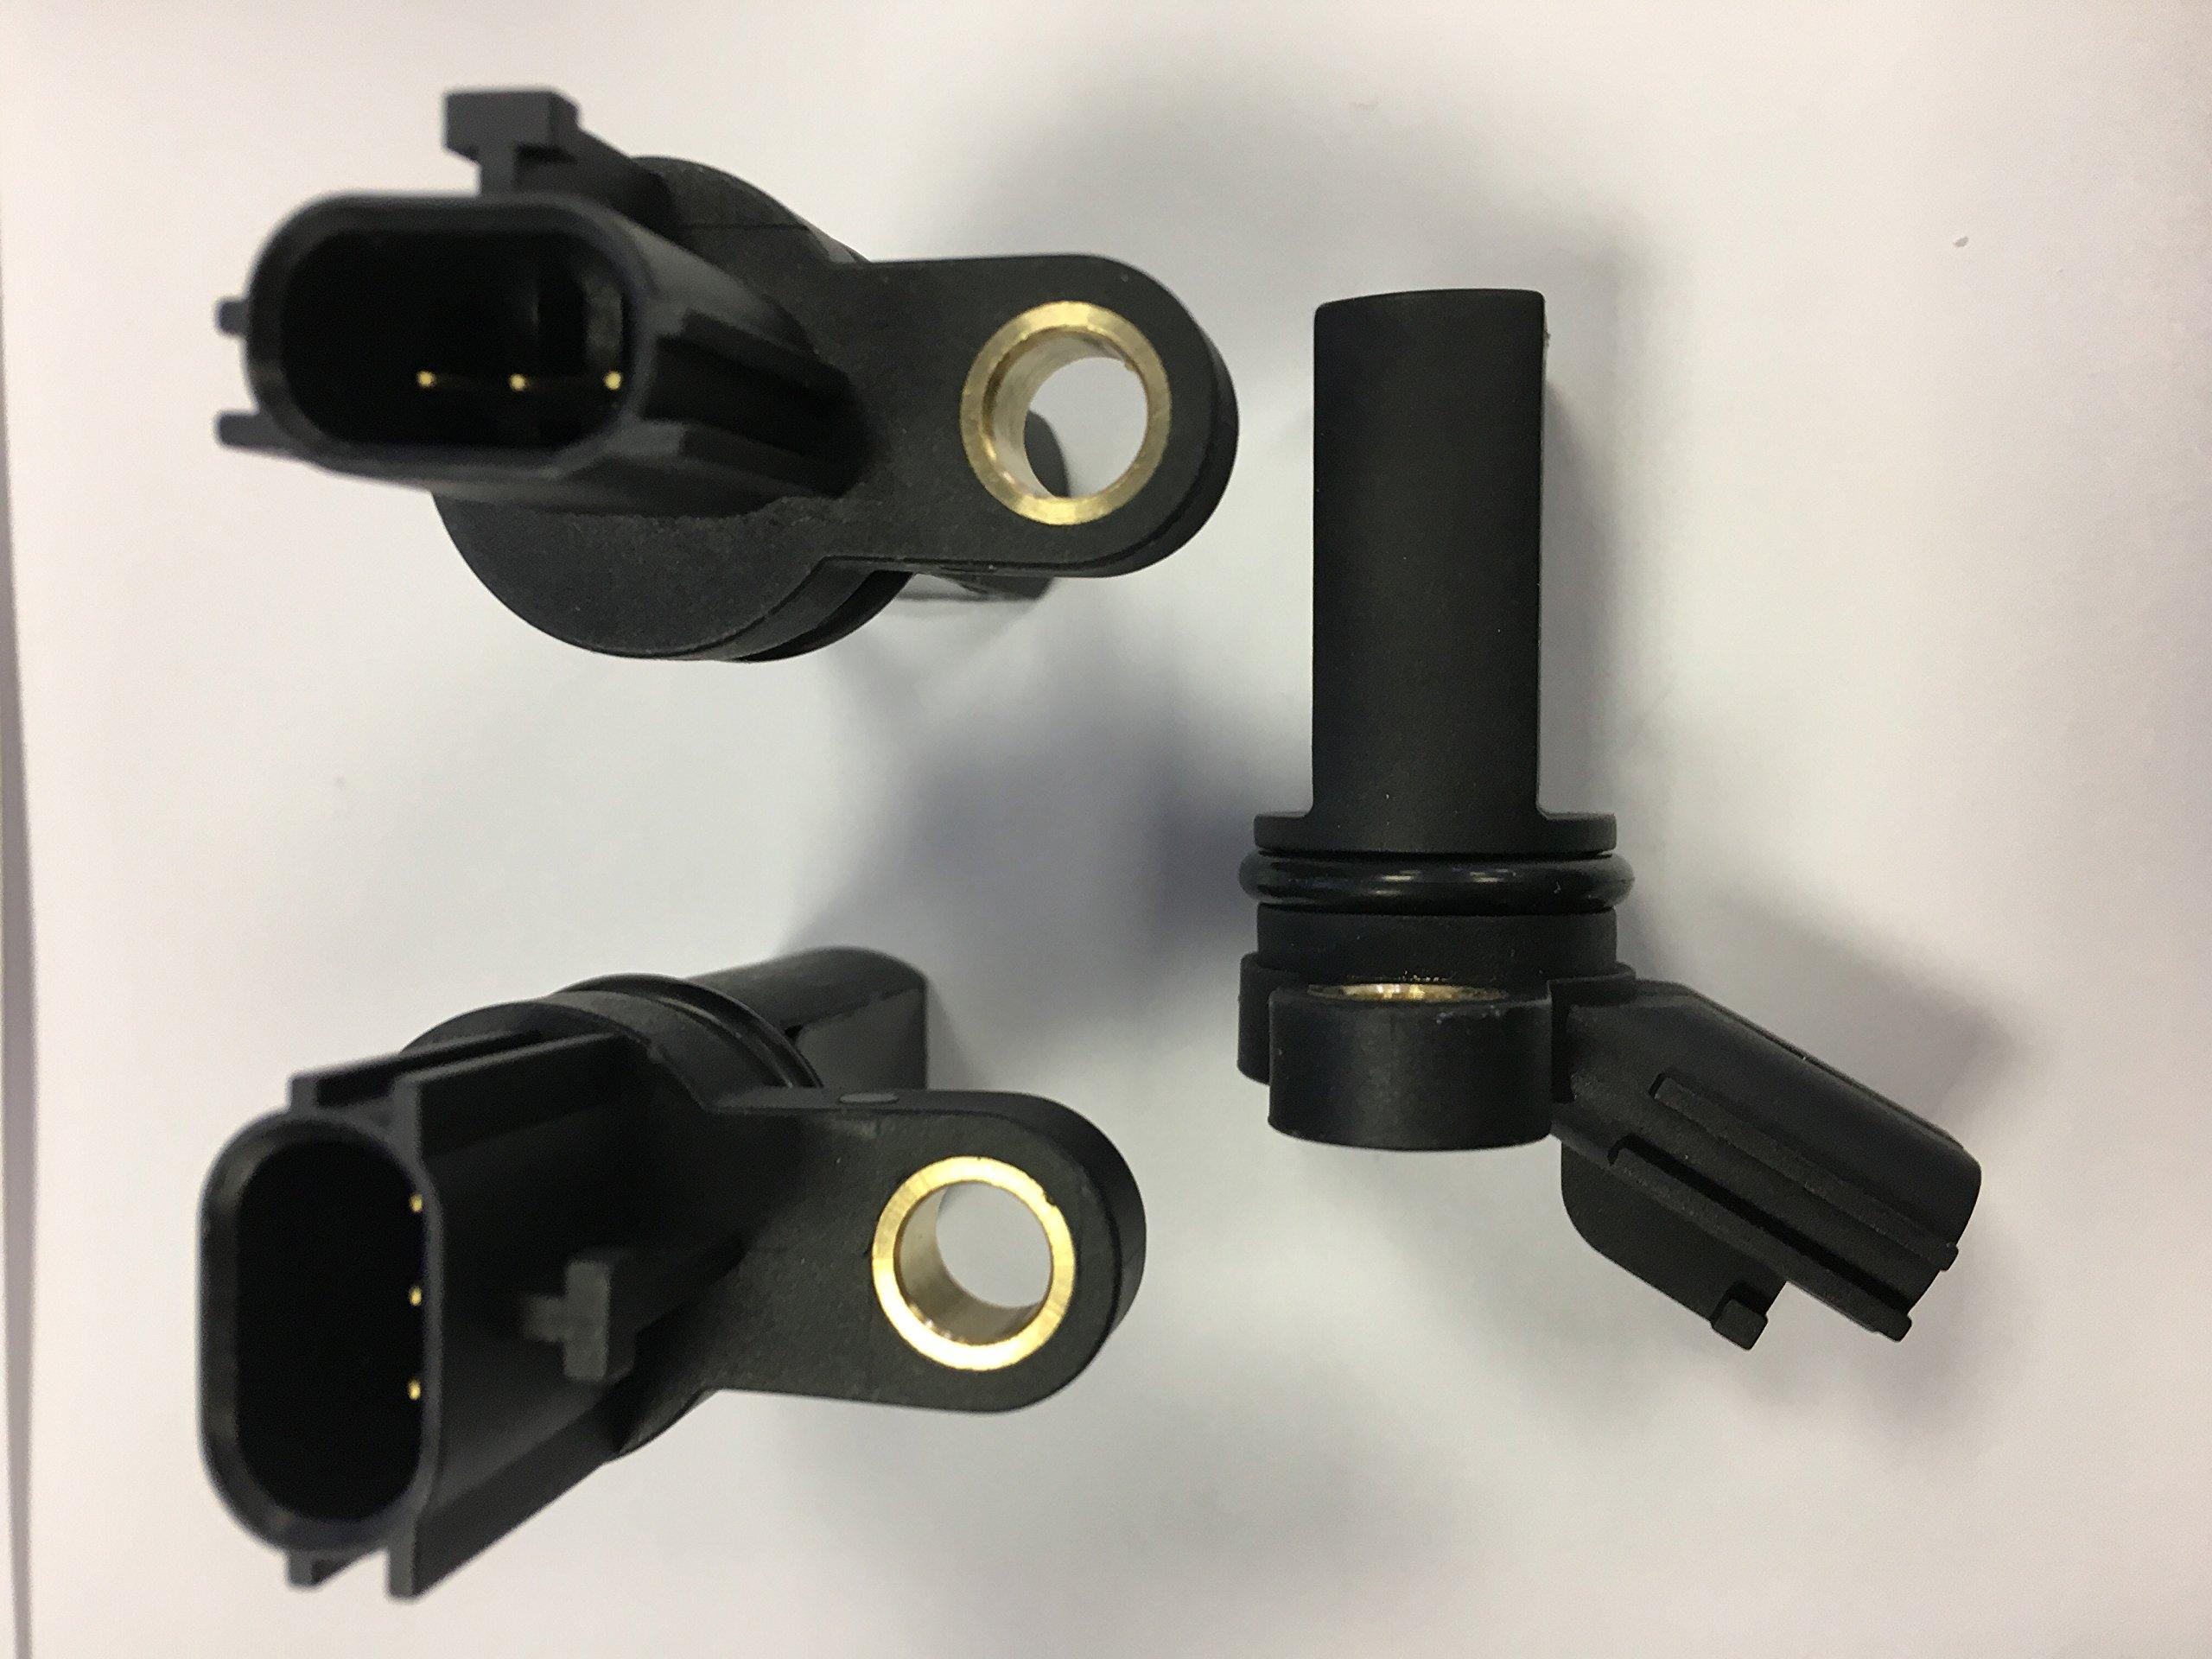 3 Piece Kit Camshaft Crankshaft Position Sensors For INFINITI & NISSAN 23731-AL61A & 23731-AL60C & 23731-6J90B